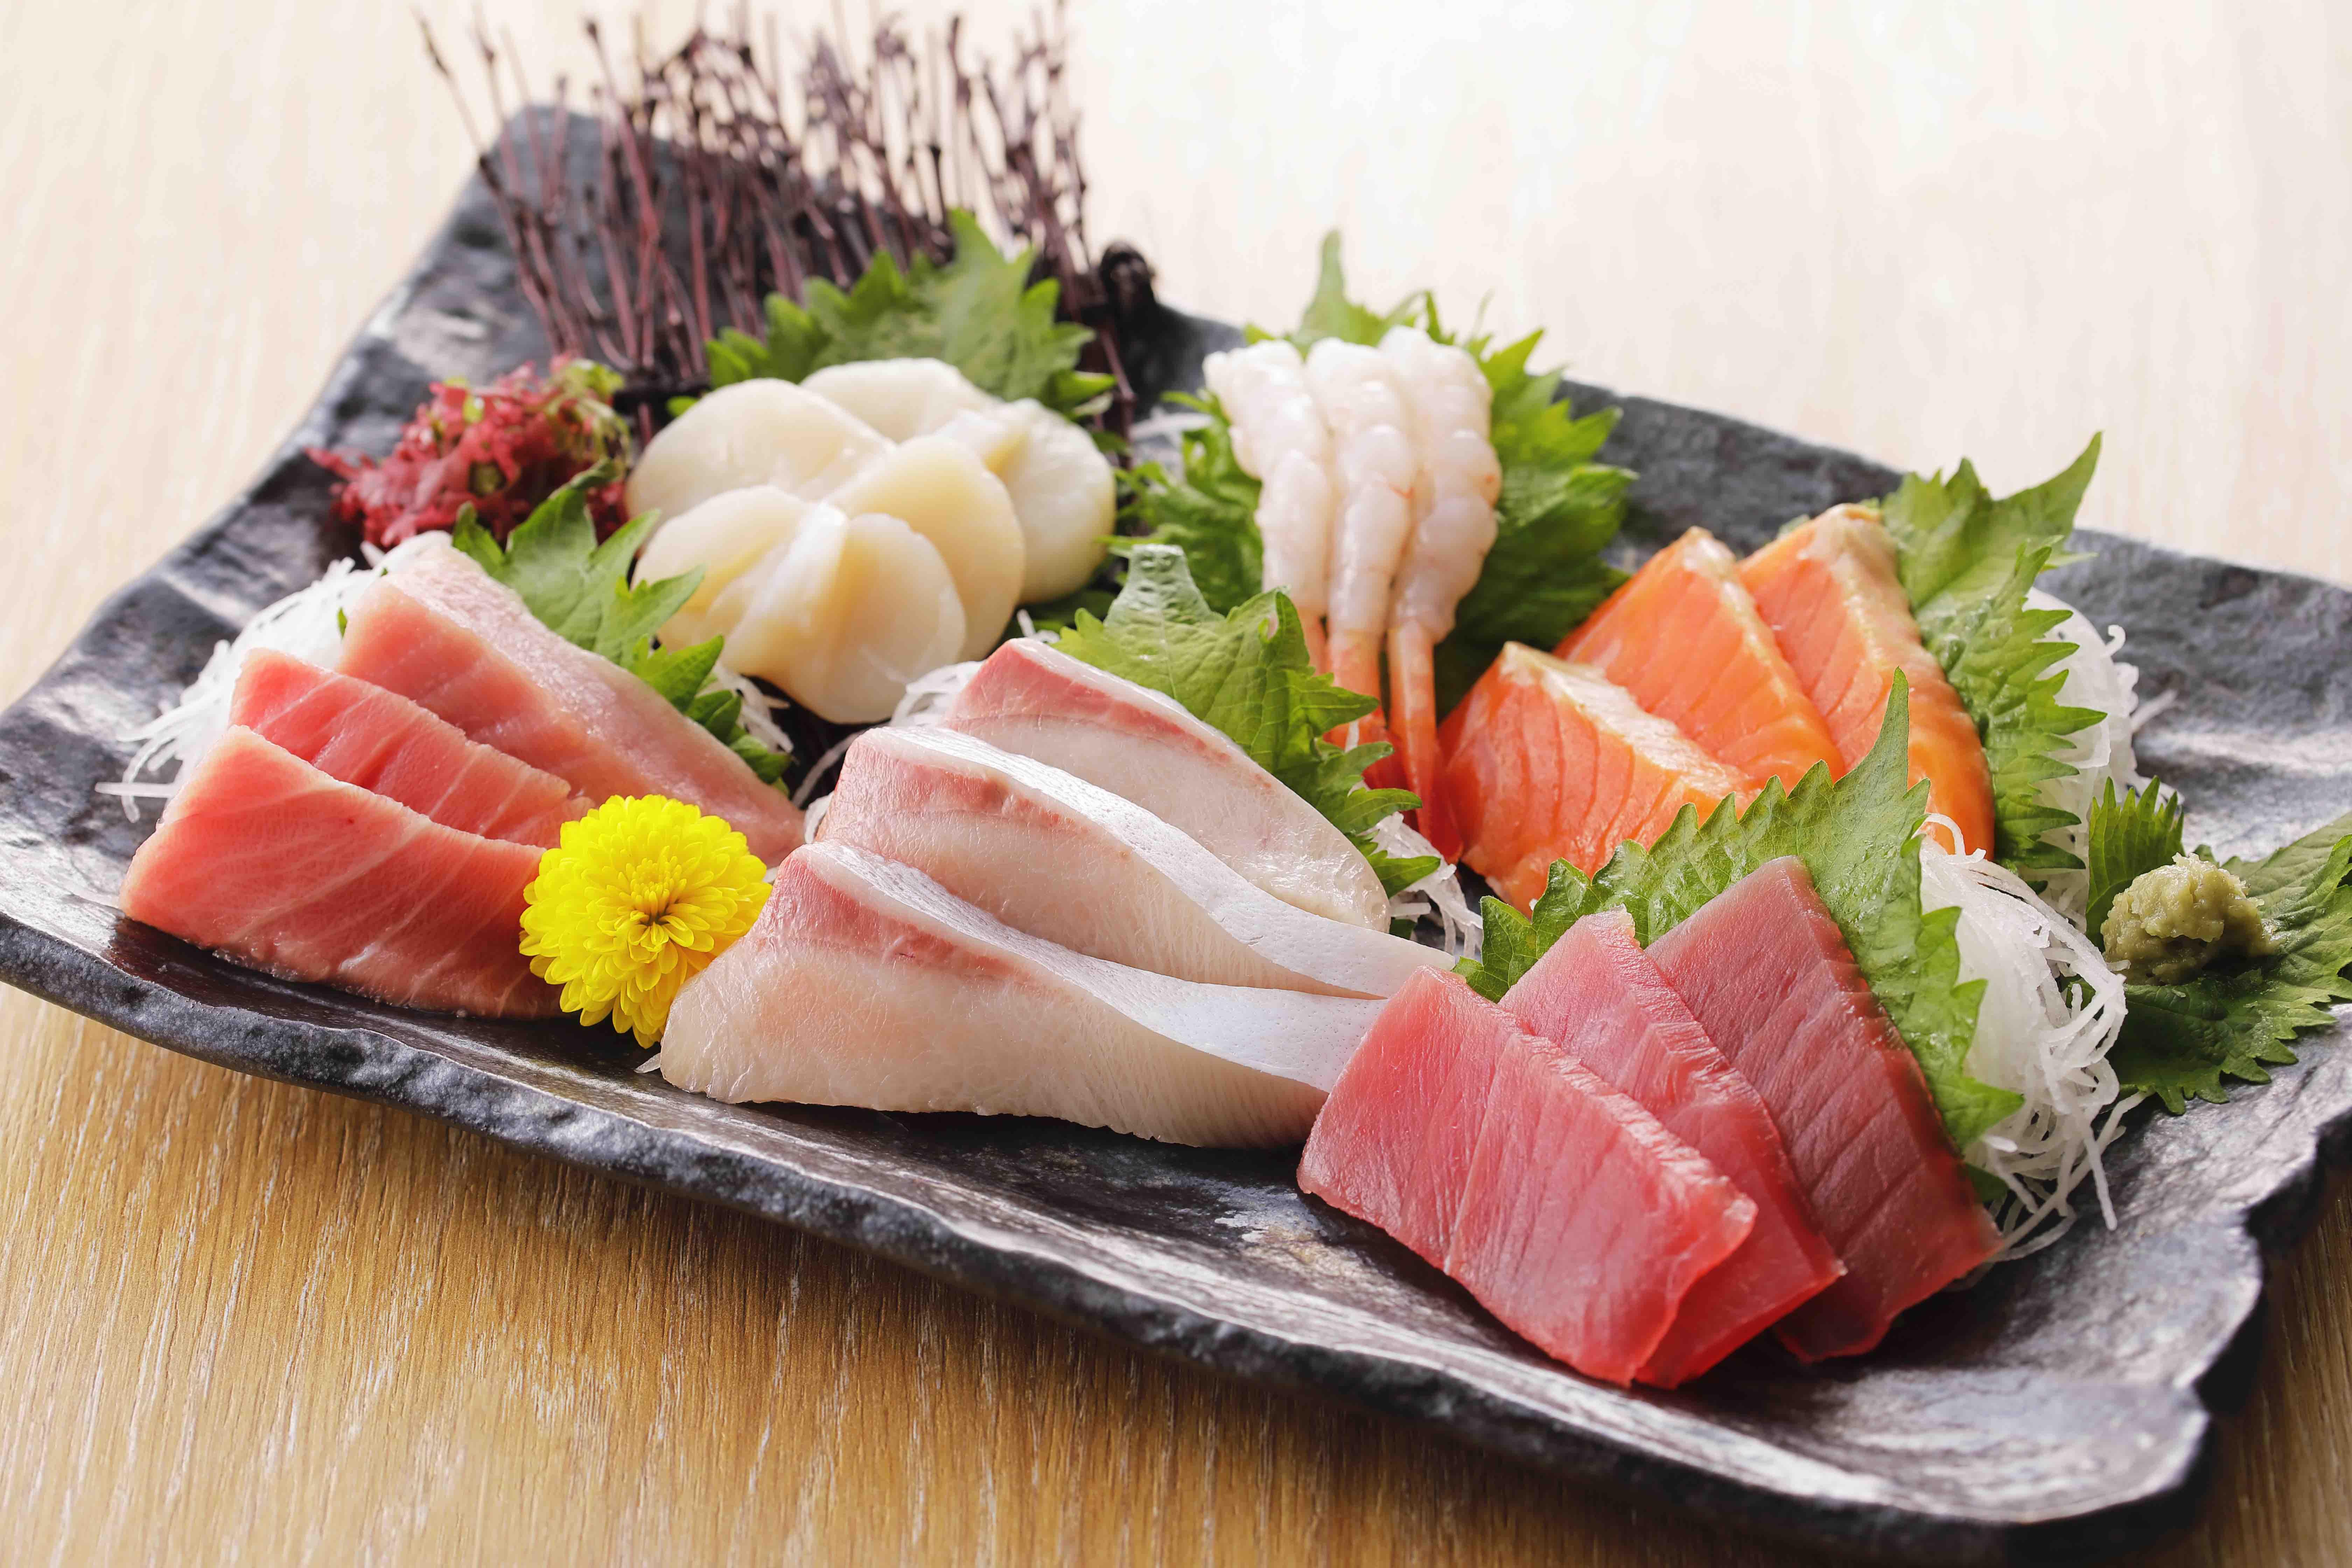 1630249685 29 otlichija sushi v japonii i drugih stranah chast 1 - ОТЛИЧИЯ СУШИ В ЯПОНИИ И ДРУГИХ СТРАНАХ   ЧАСТЬ 1